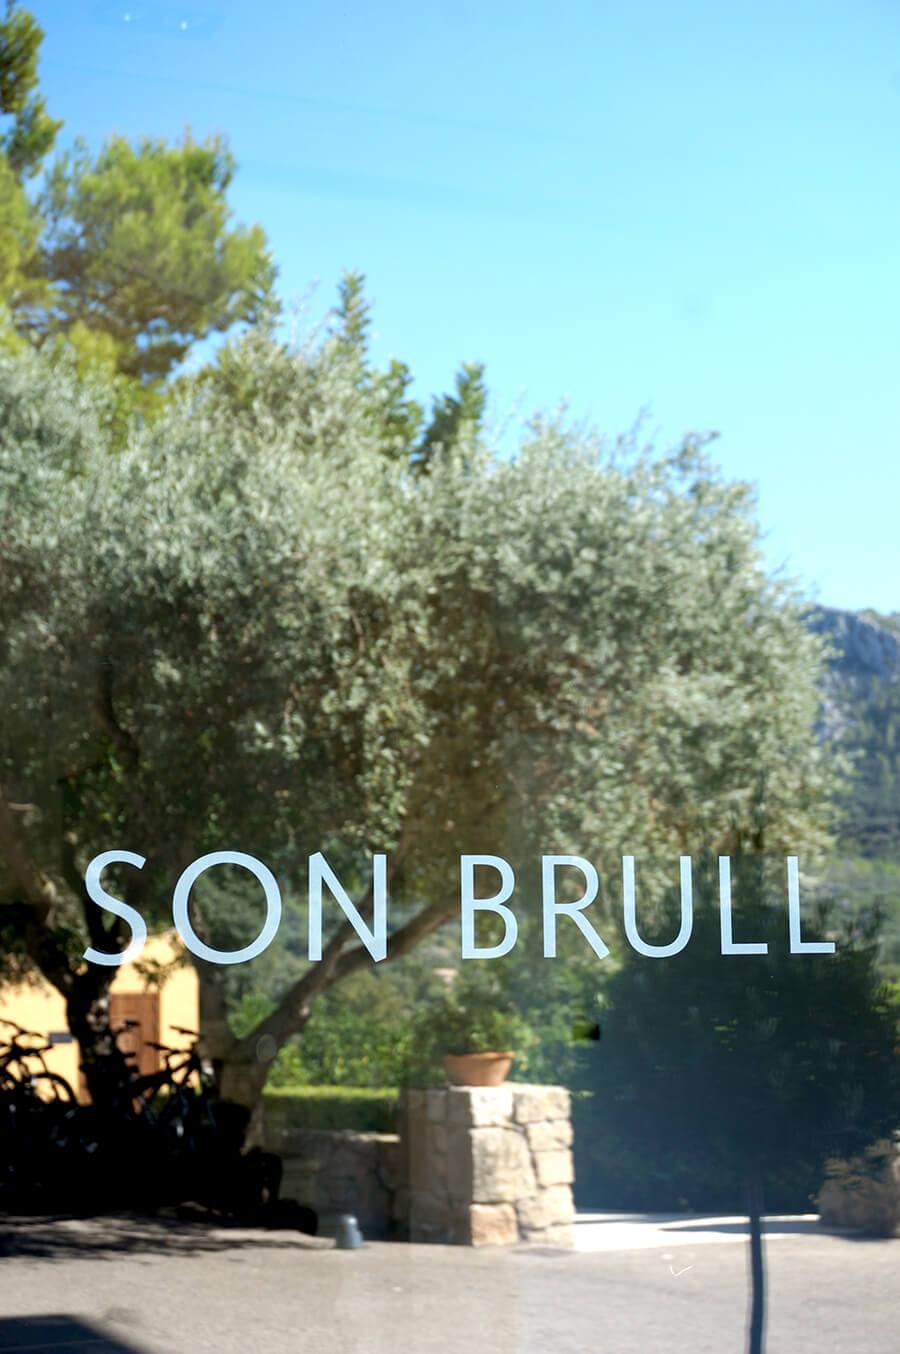 Espanolita_SonBrull_16.jpg